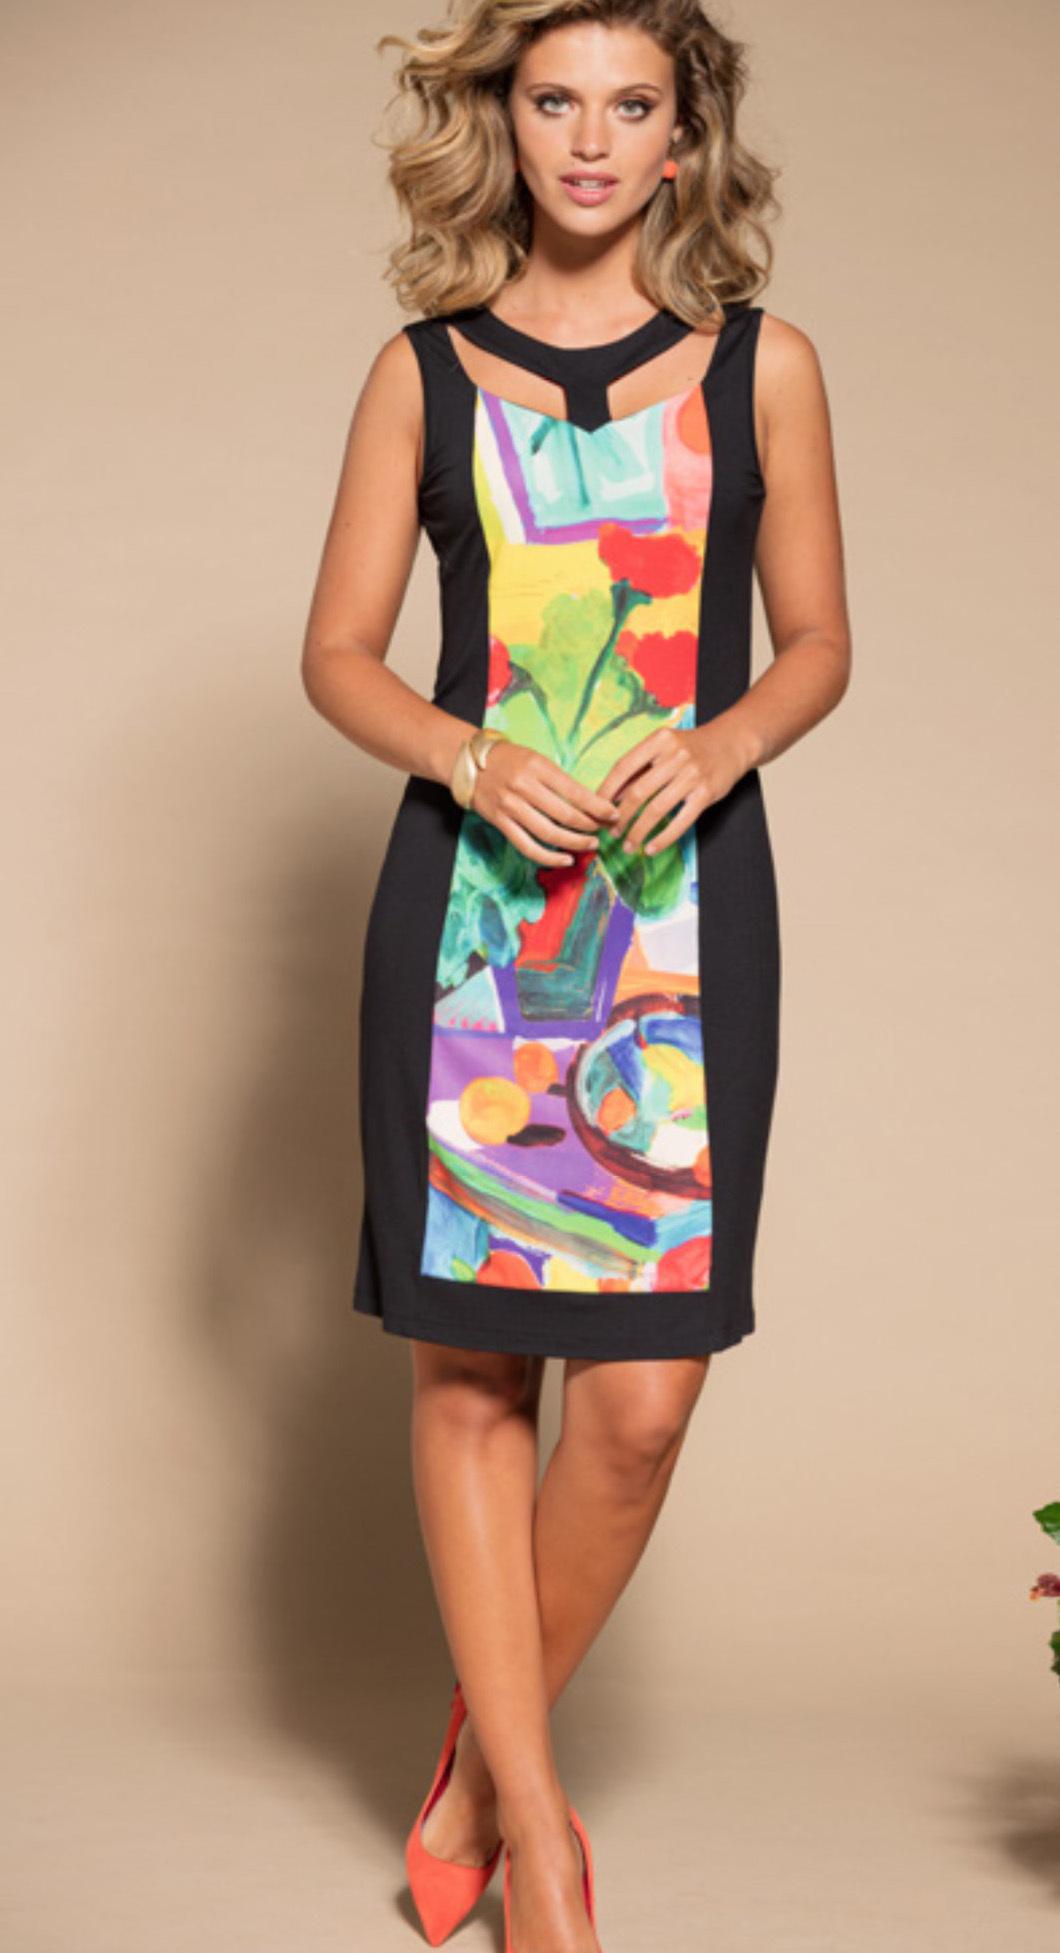 Maloka: Apples & Cherries Color Contrast Midi Dress (More Art Patterns!) MK_FLORENCE